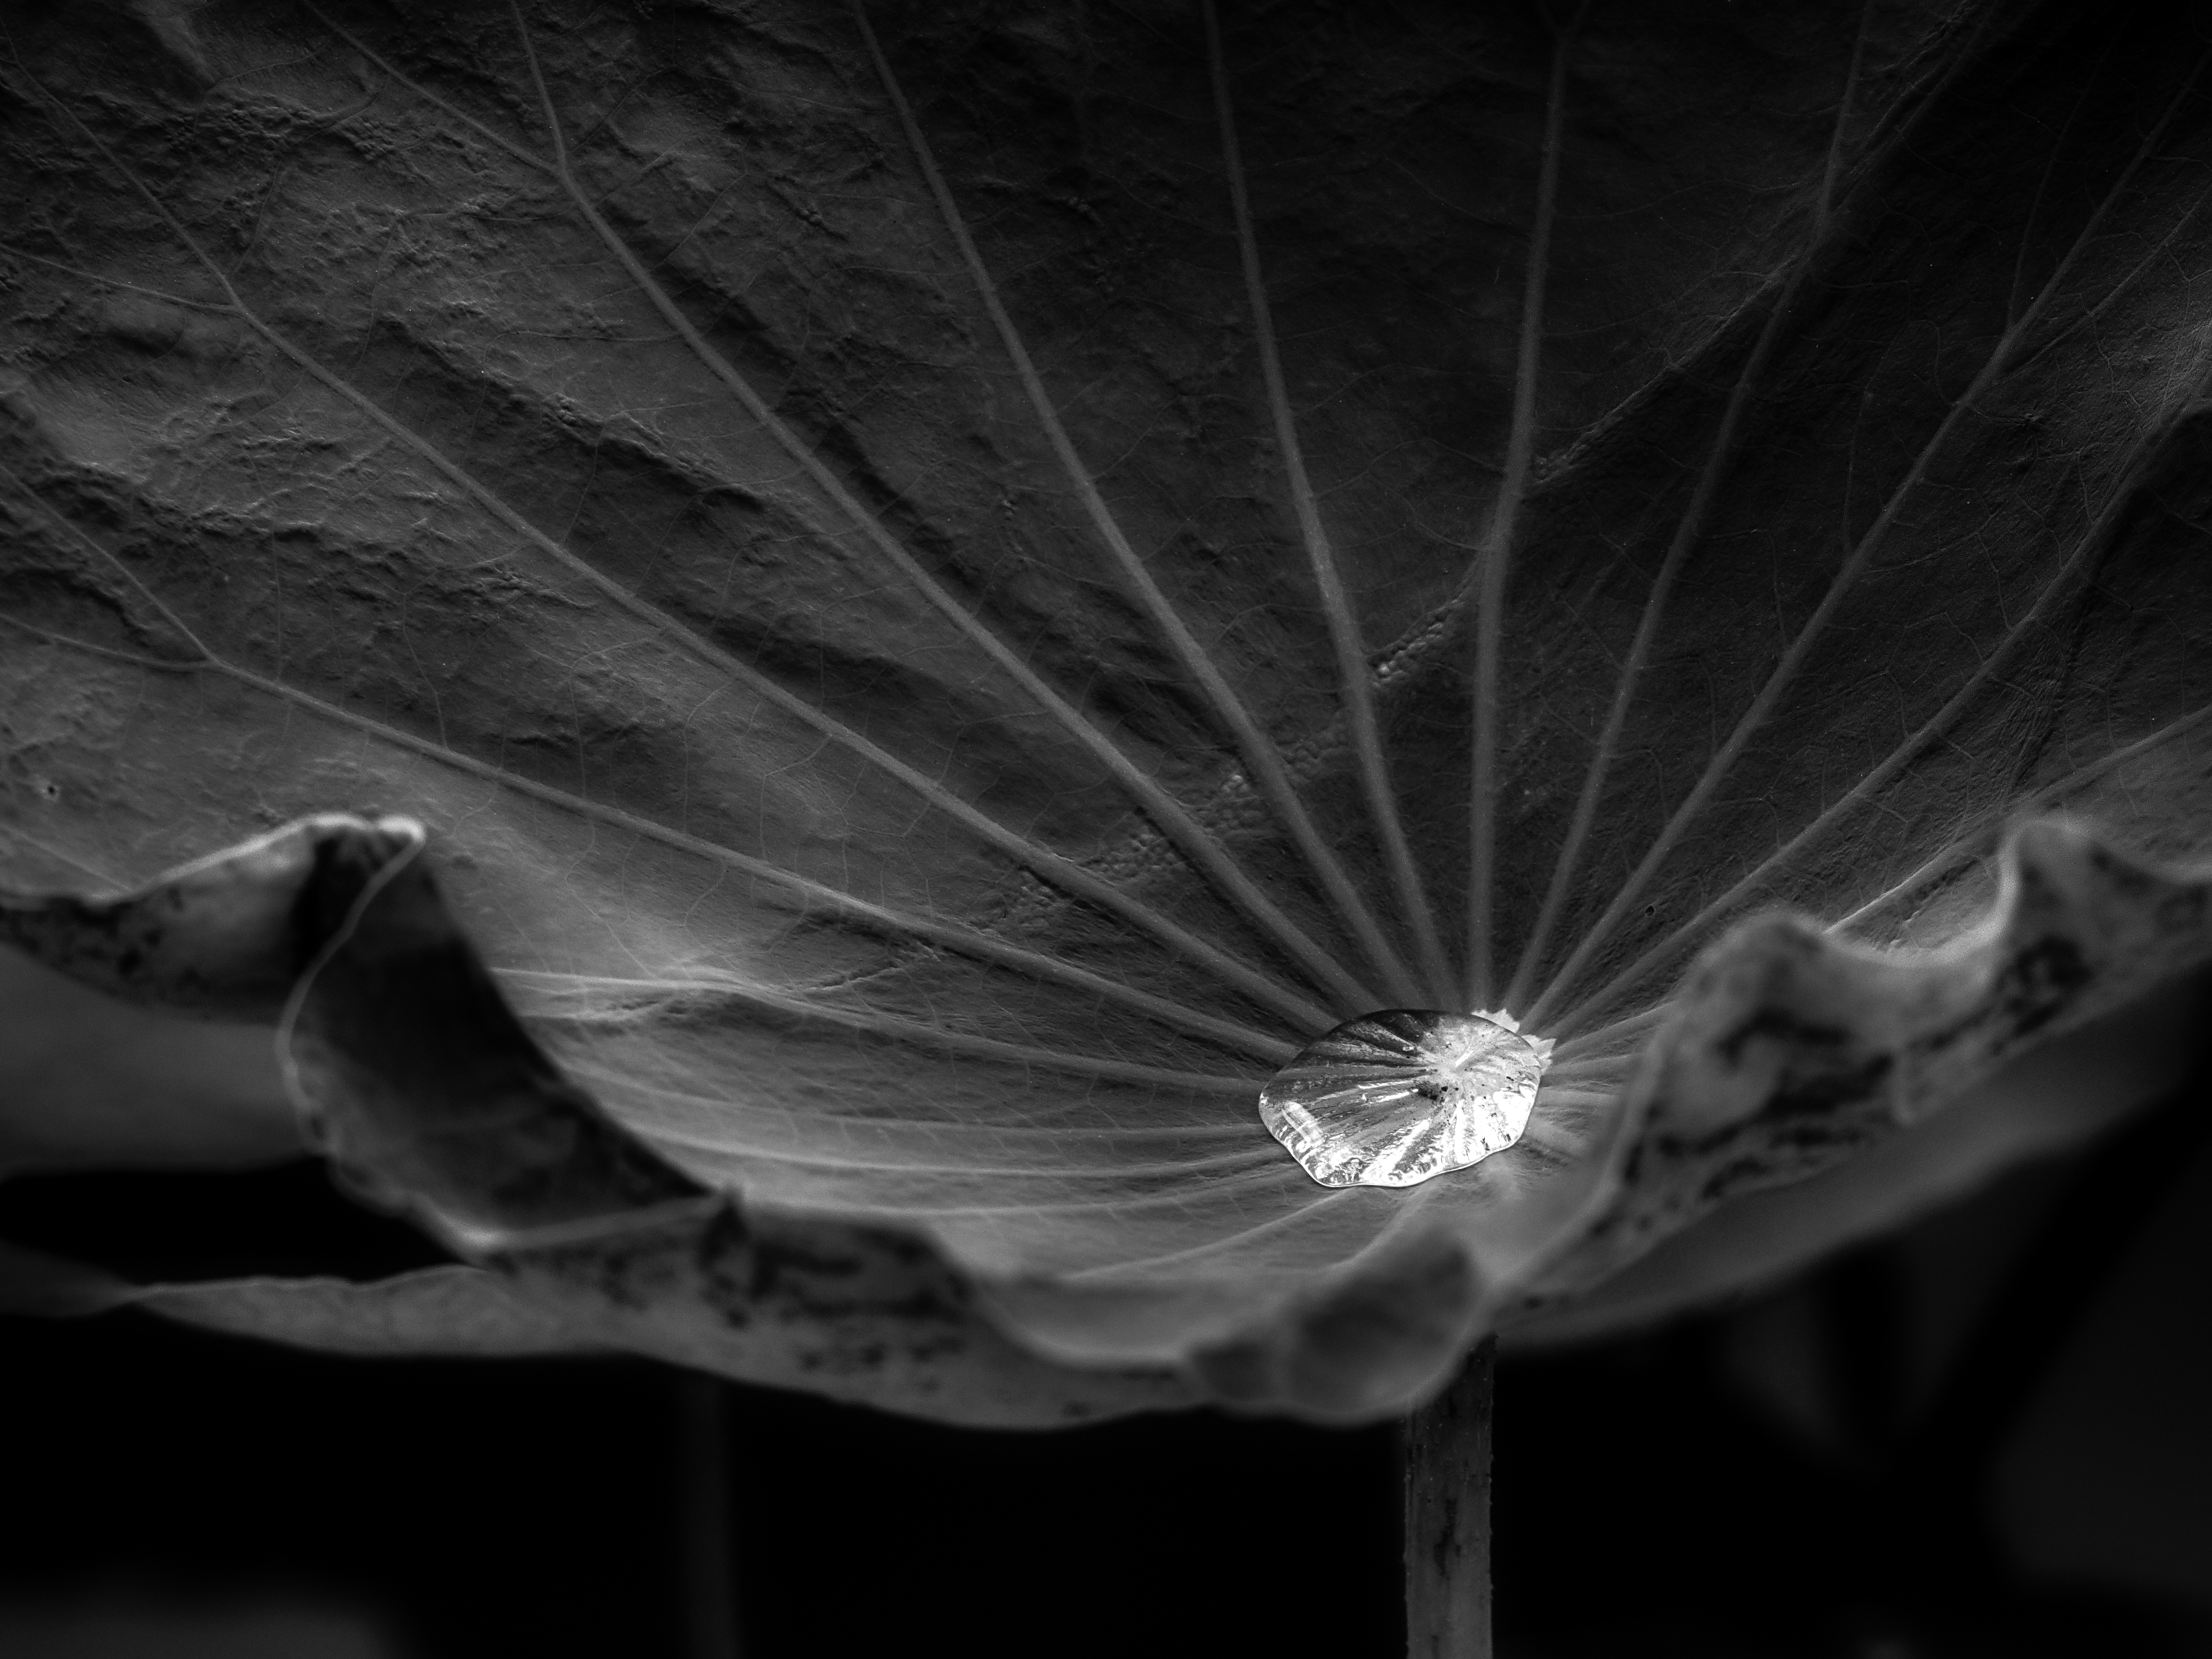 balance-Matthias-Stump-002